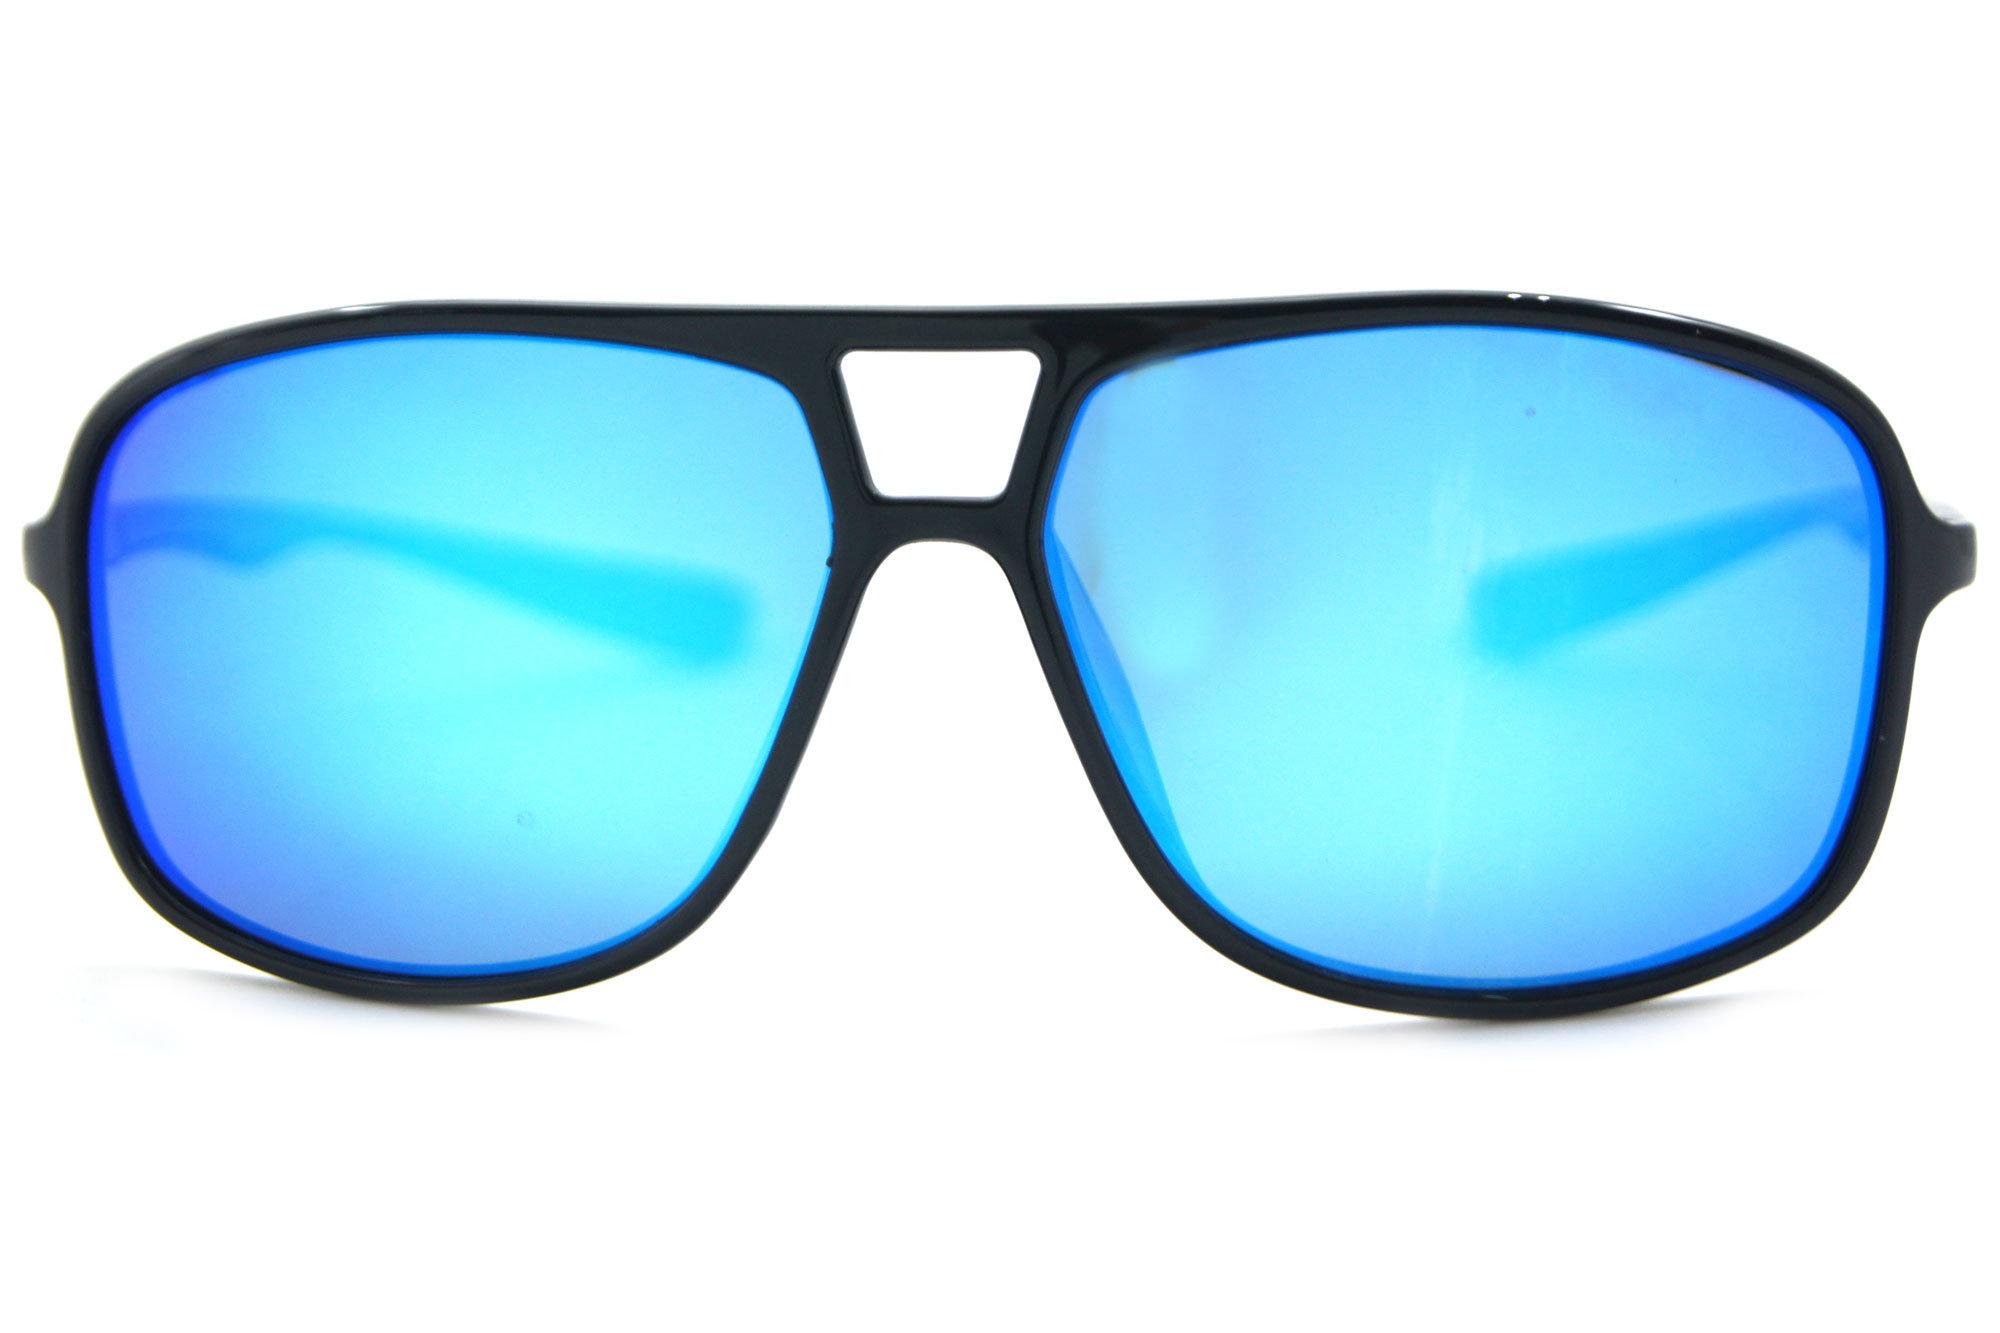 2016 High Quality Best Design Promation Classical Plastic Sunglasses